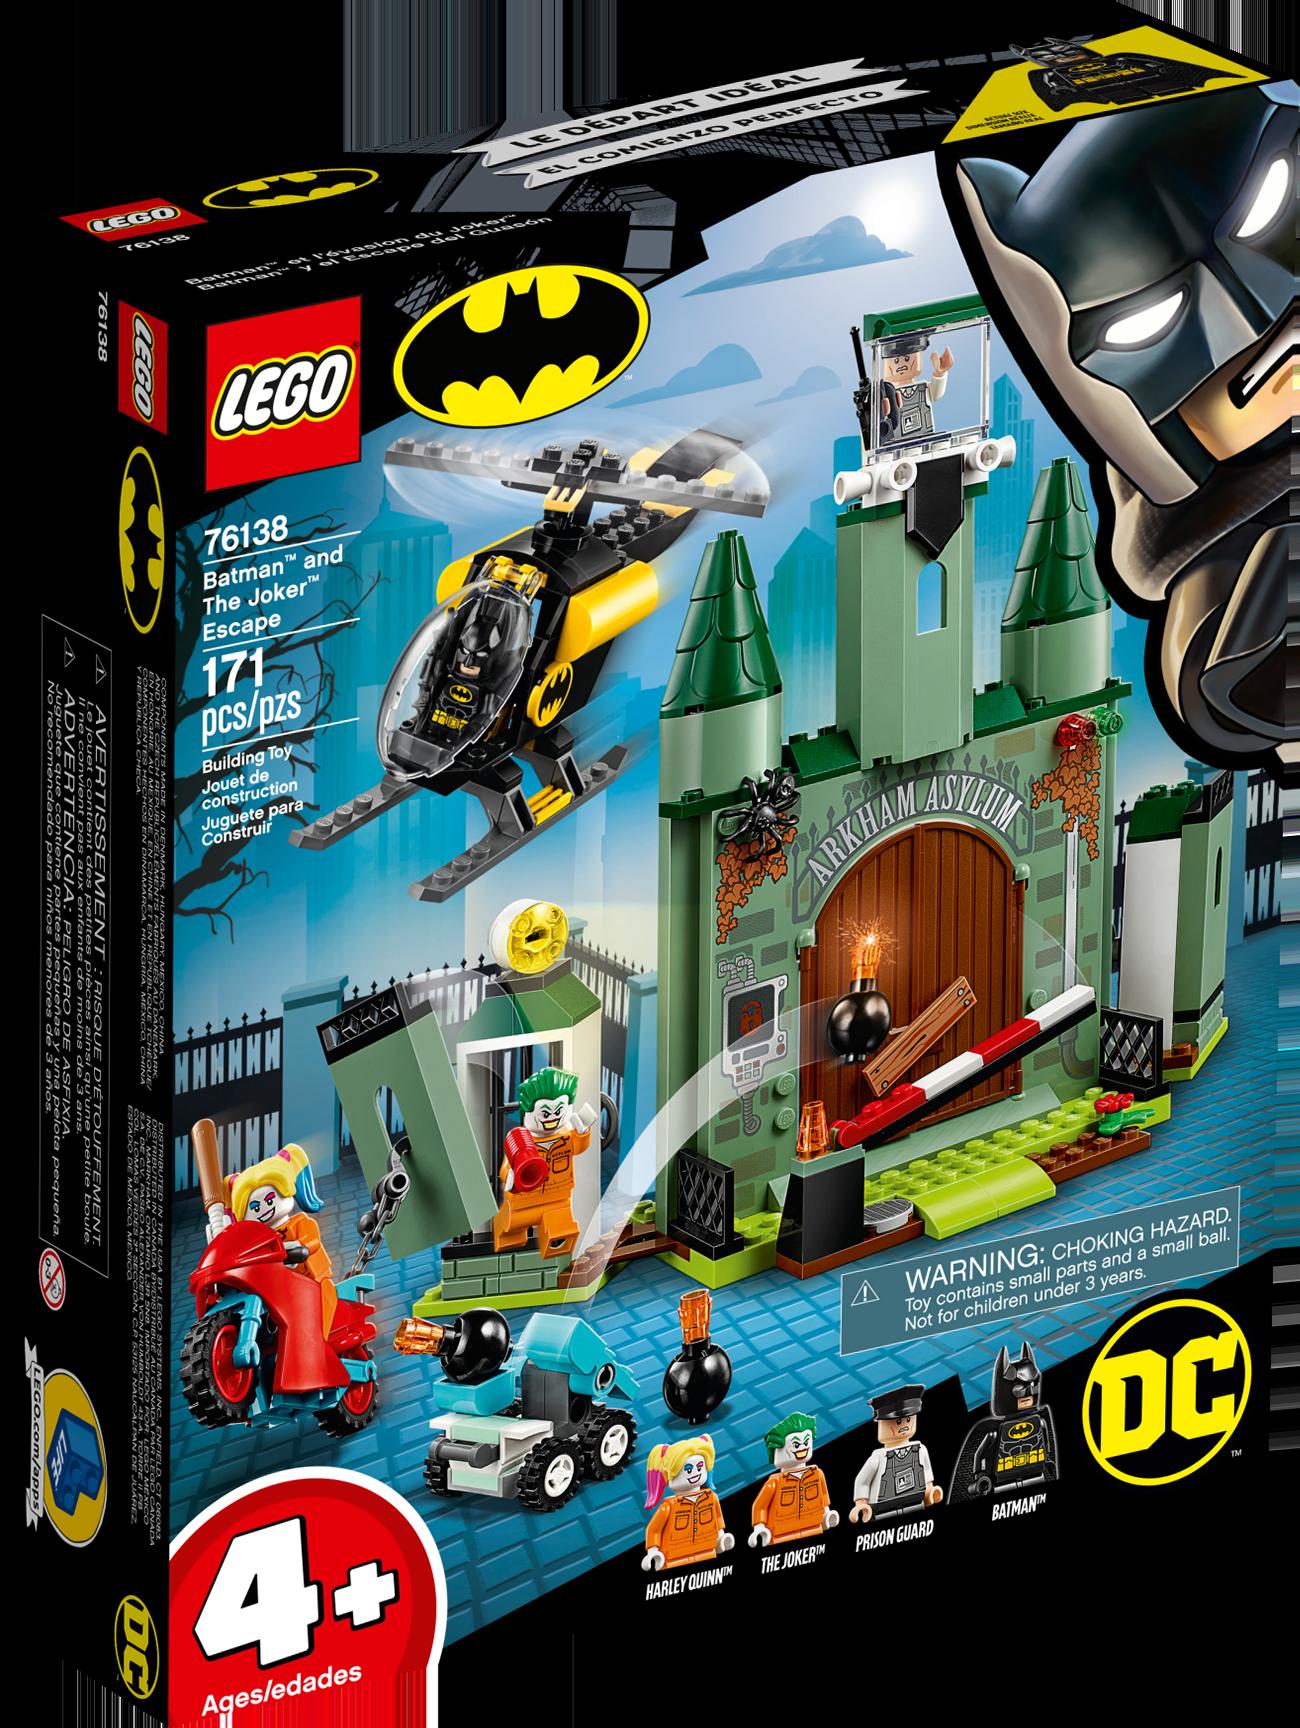 "Batman"" and The Joker"" Escape"